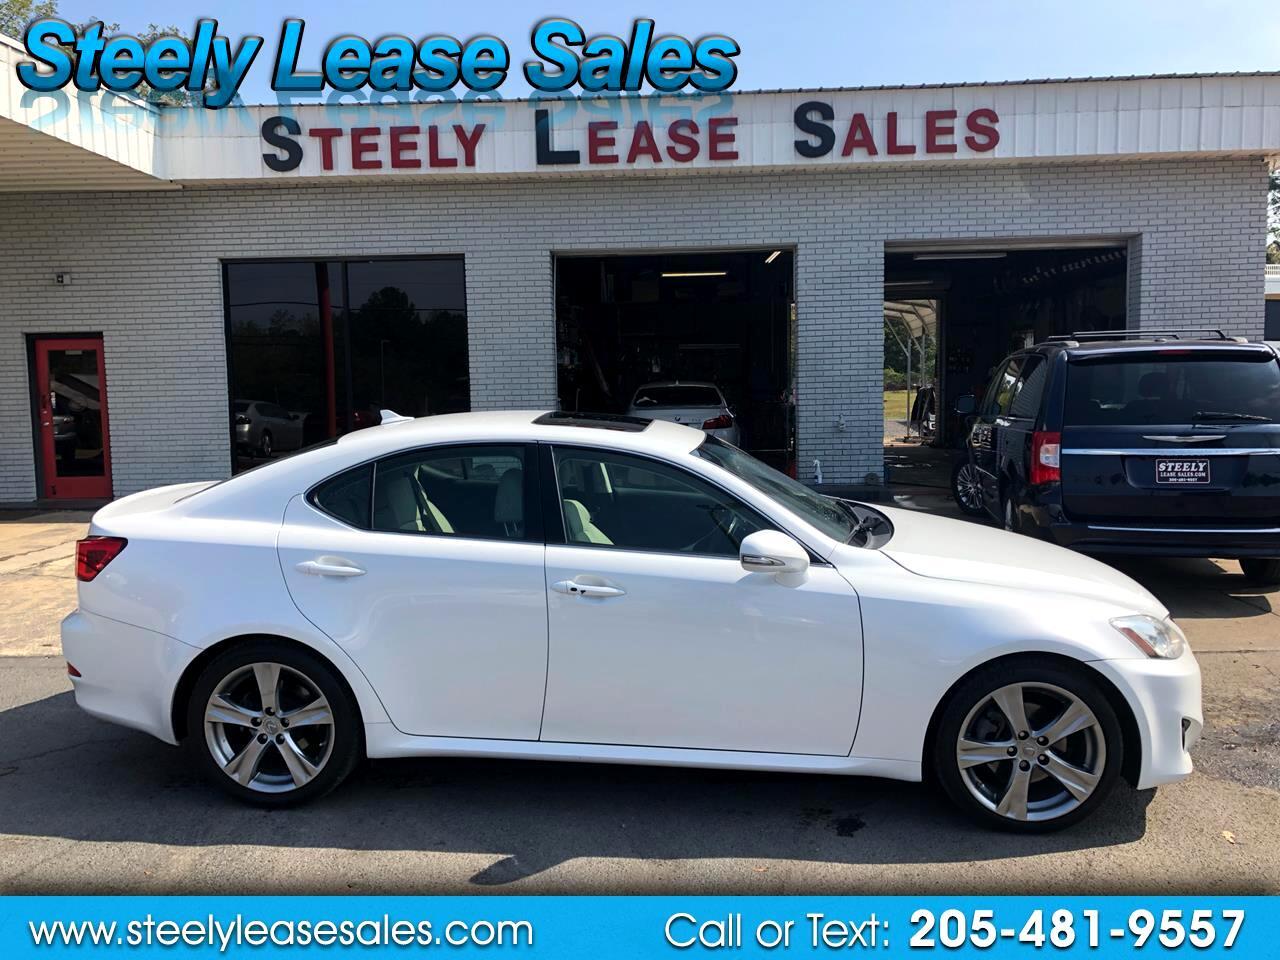 Lexus Is 250 Lease >> Used 2012 Lexus Is 250 In Bessemer Al Auto Com Jthbf5c27c5179953